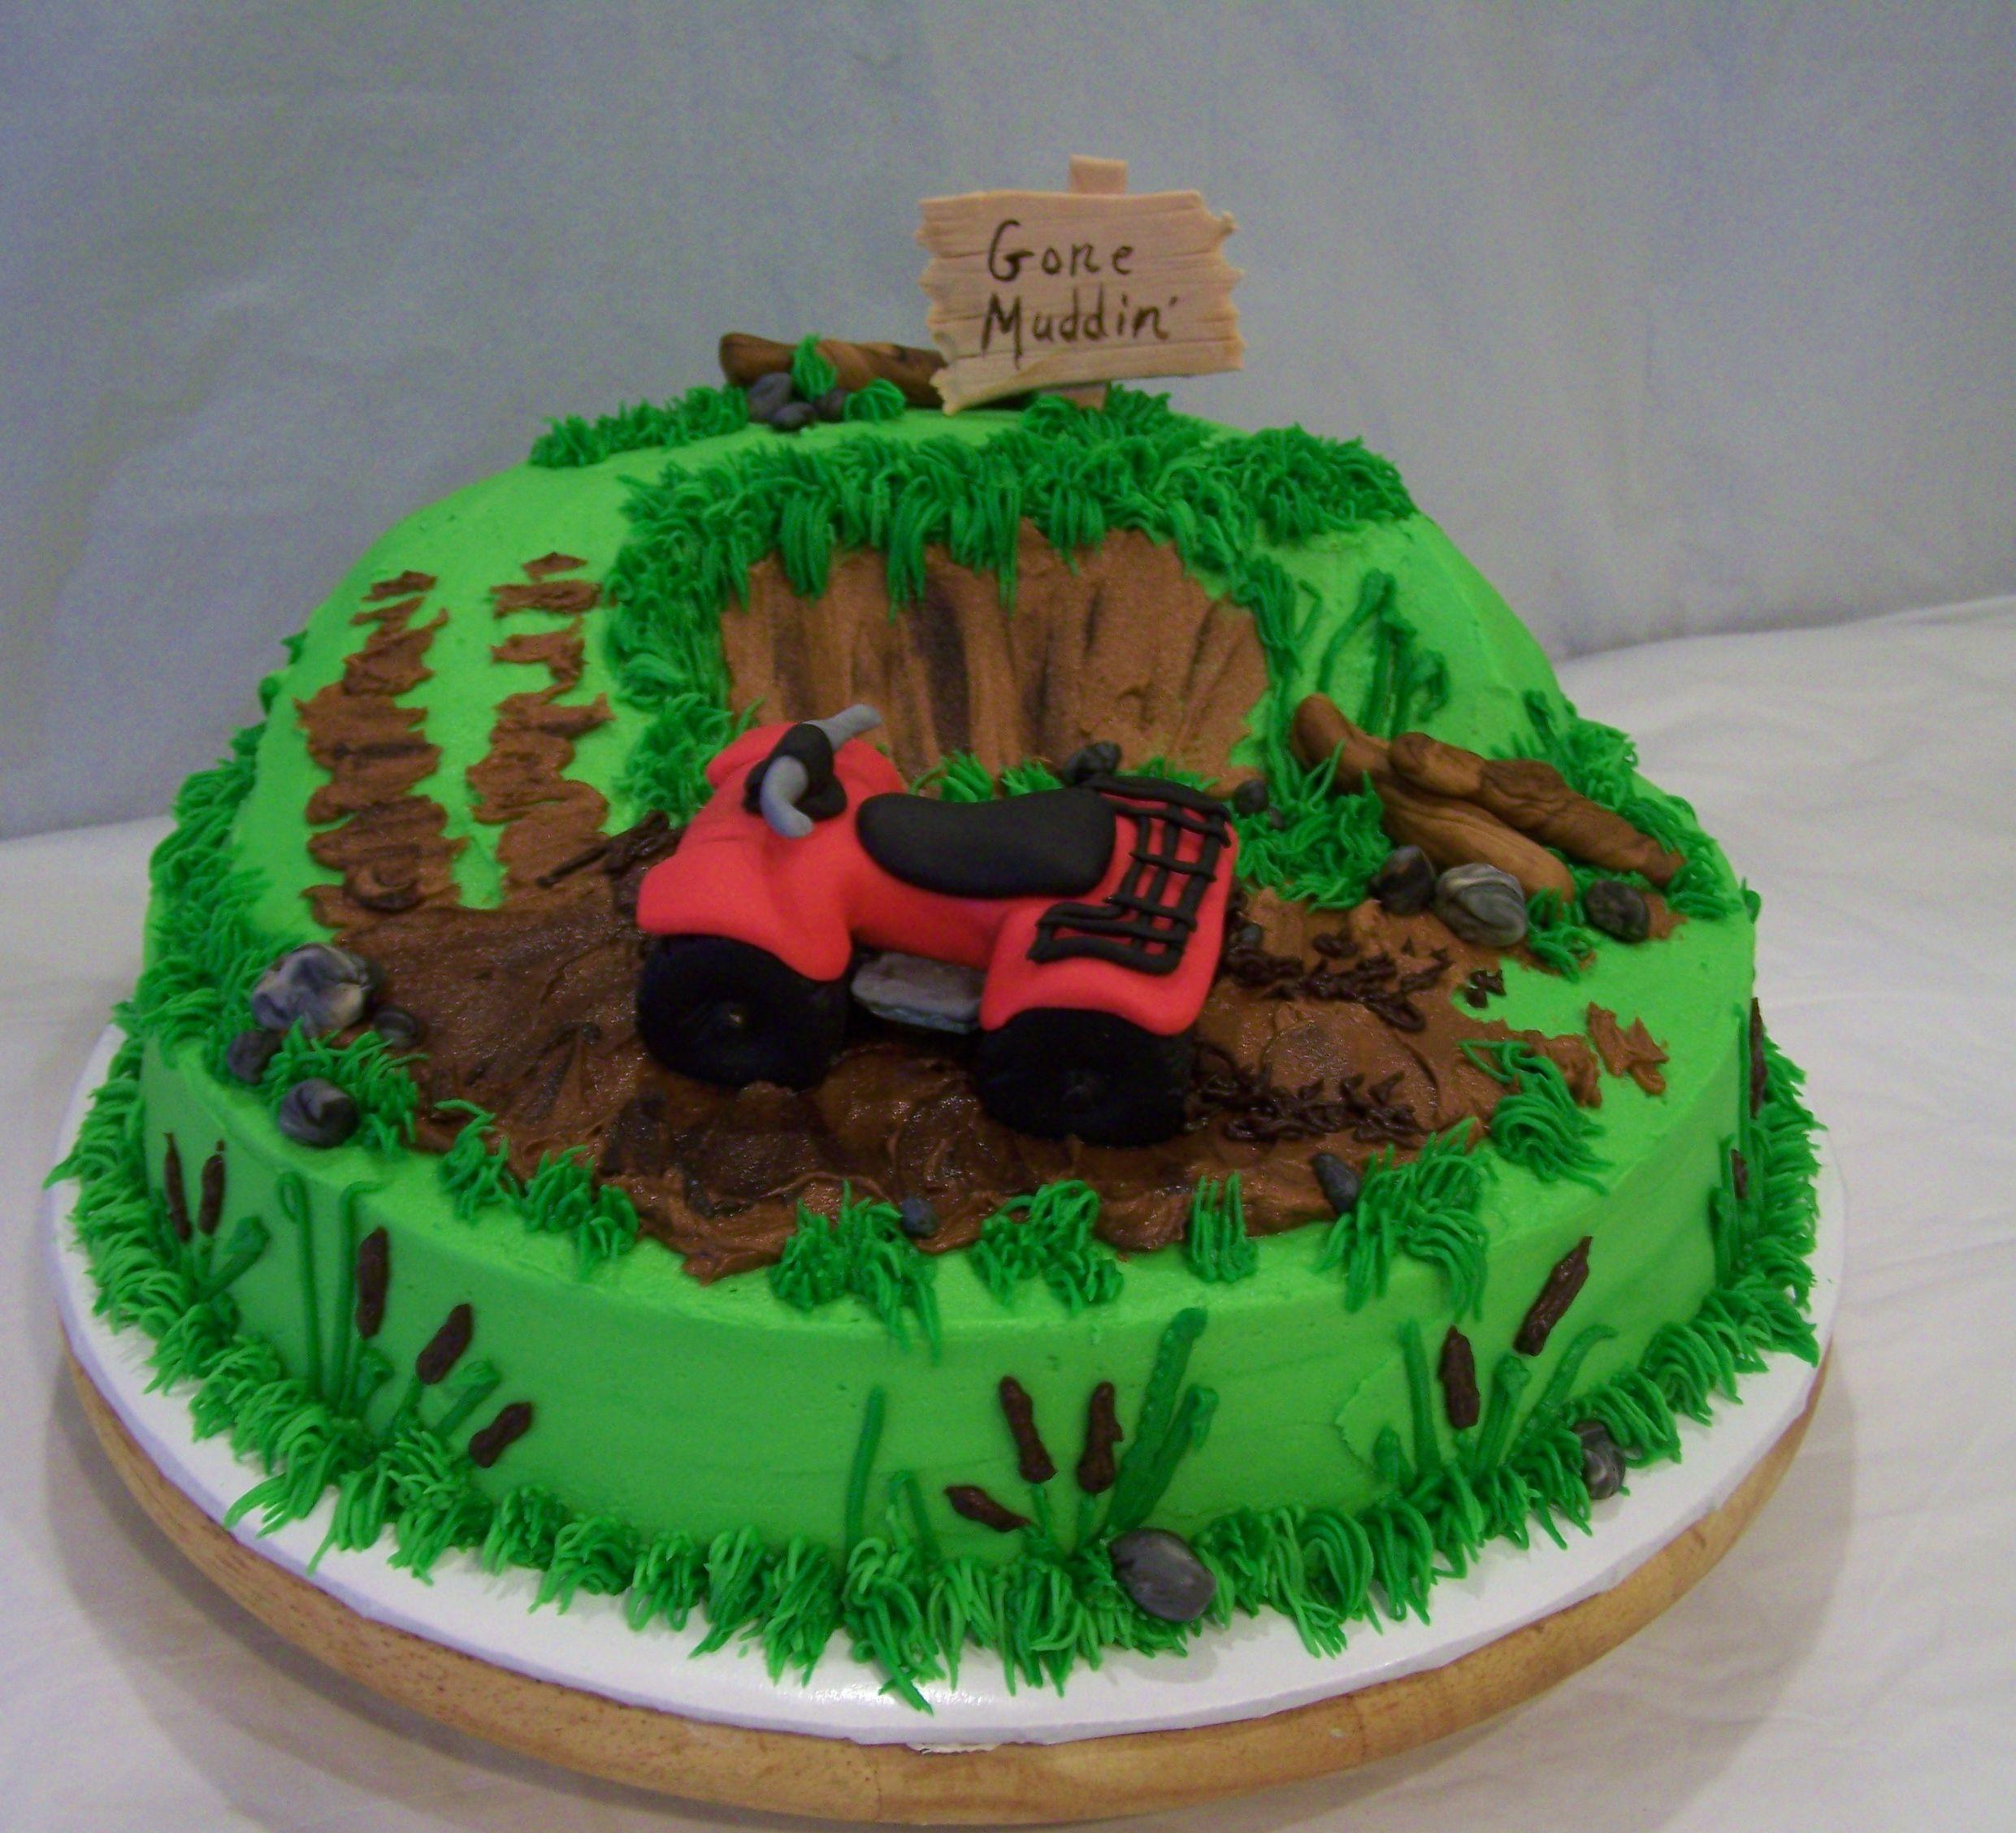 Pleasing Fondant 4 Wheeler Mudding Cake 4 Wheeler Cake Birthday Cakes Funny Birthday Cards Online Aboleapandamsfinfo